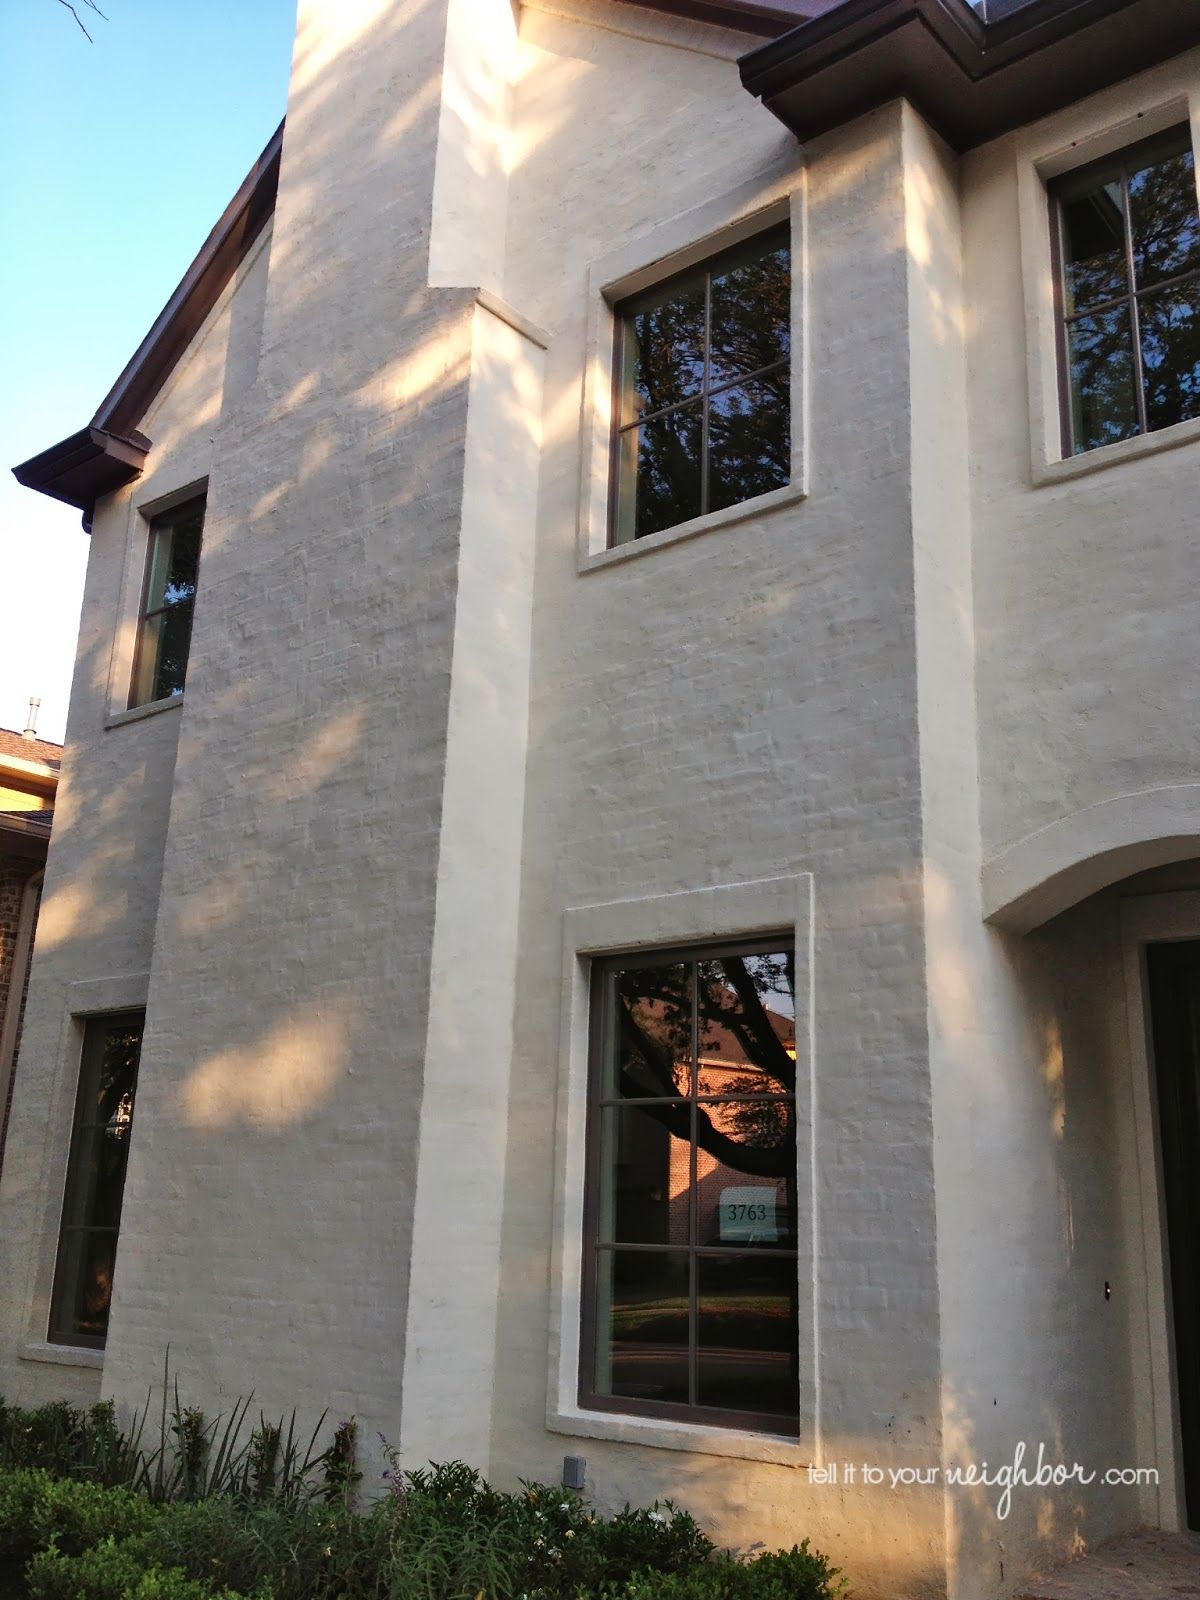 Slurried Brick Mortar Washed Sacked Brick Painted